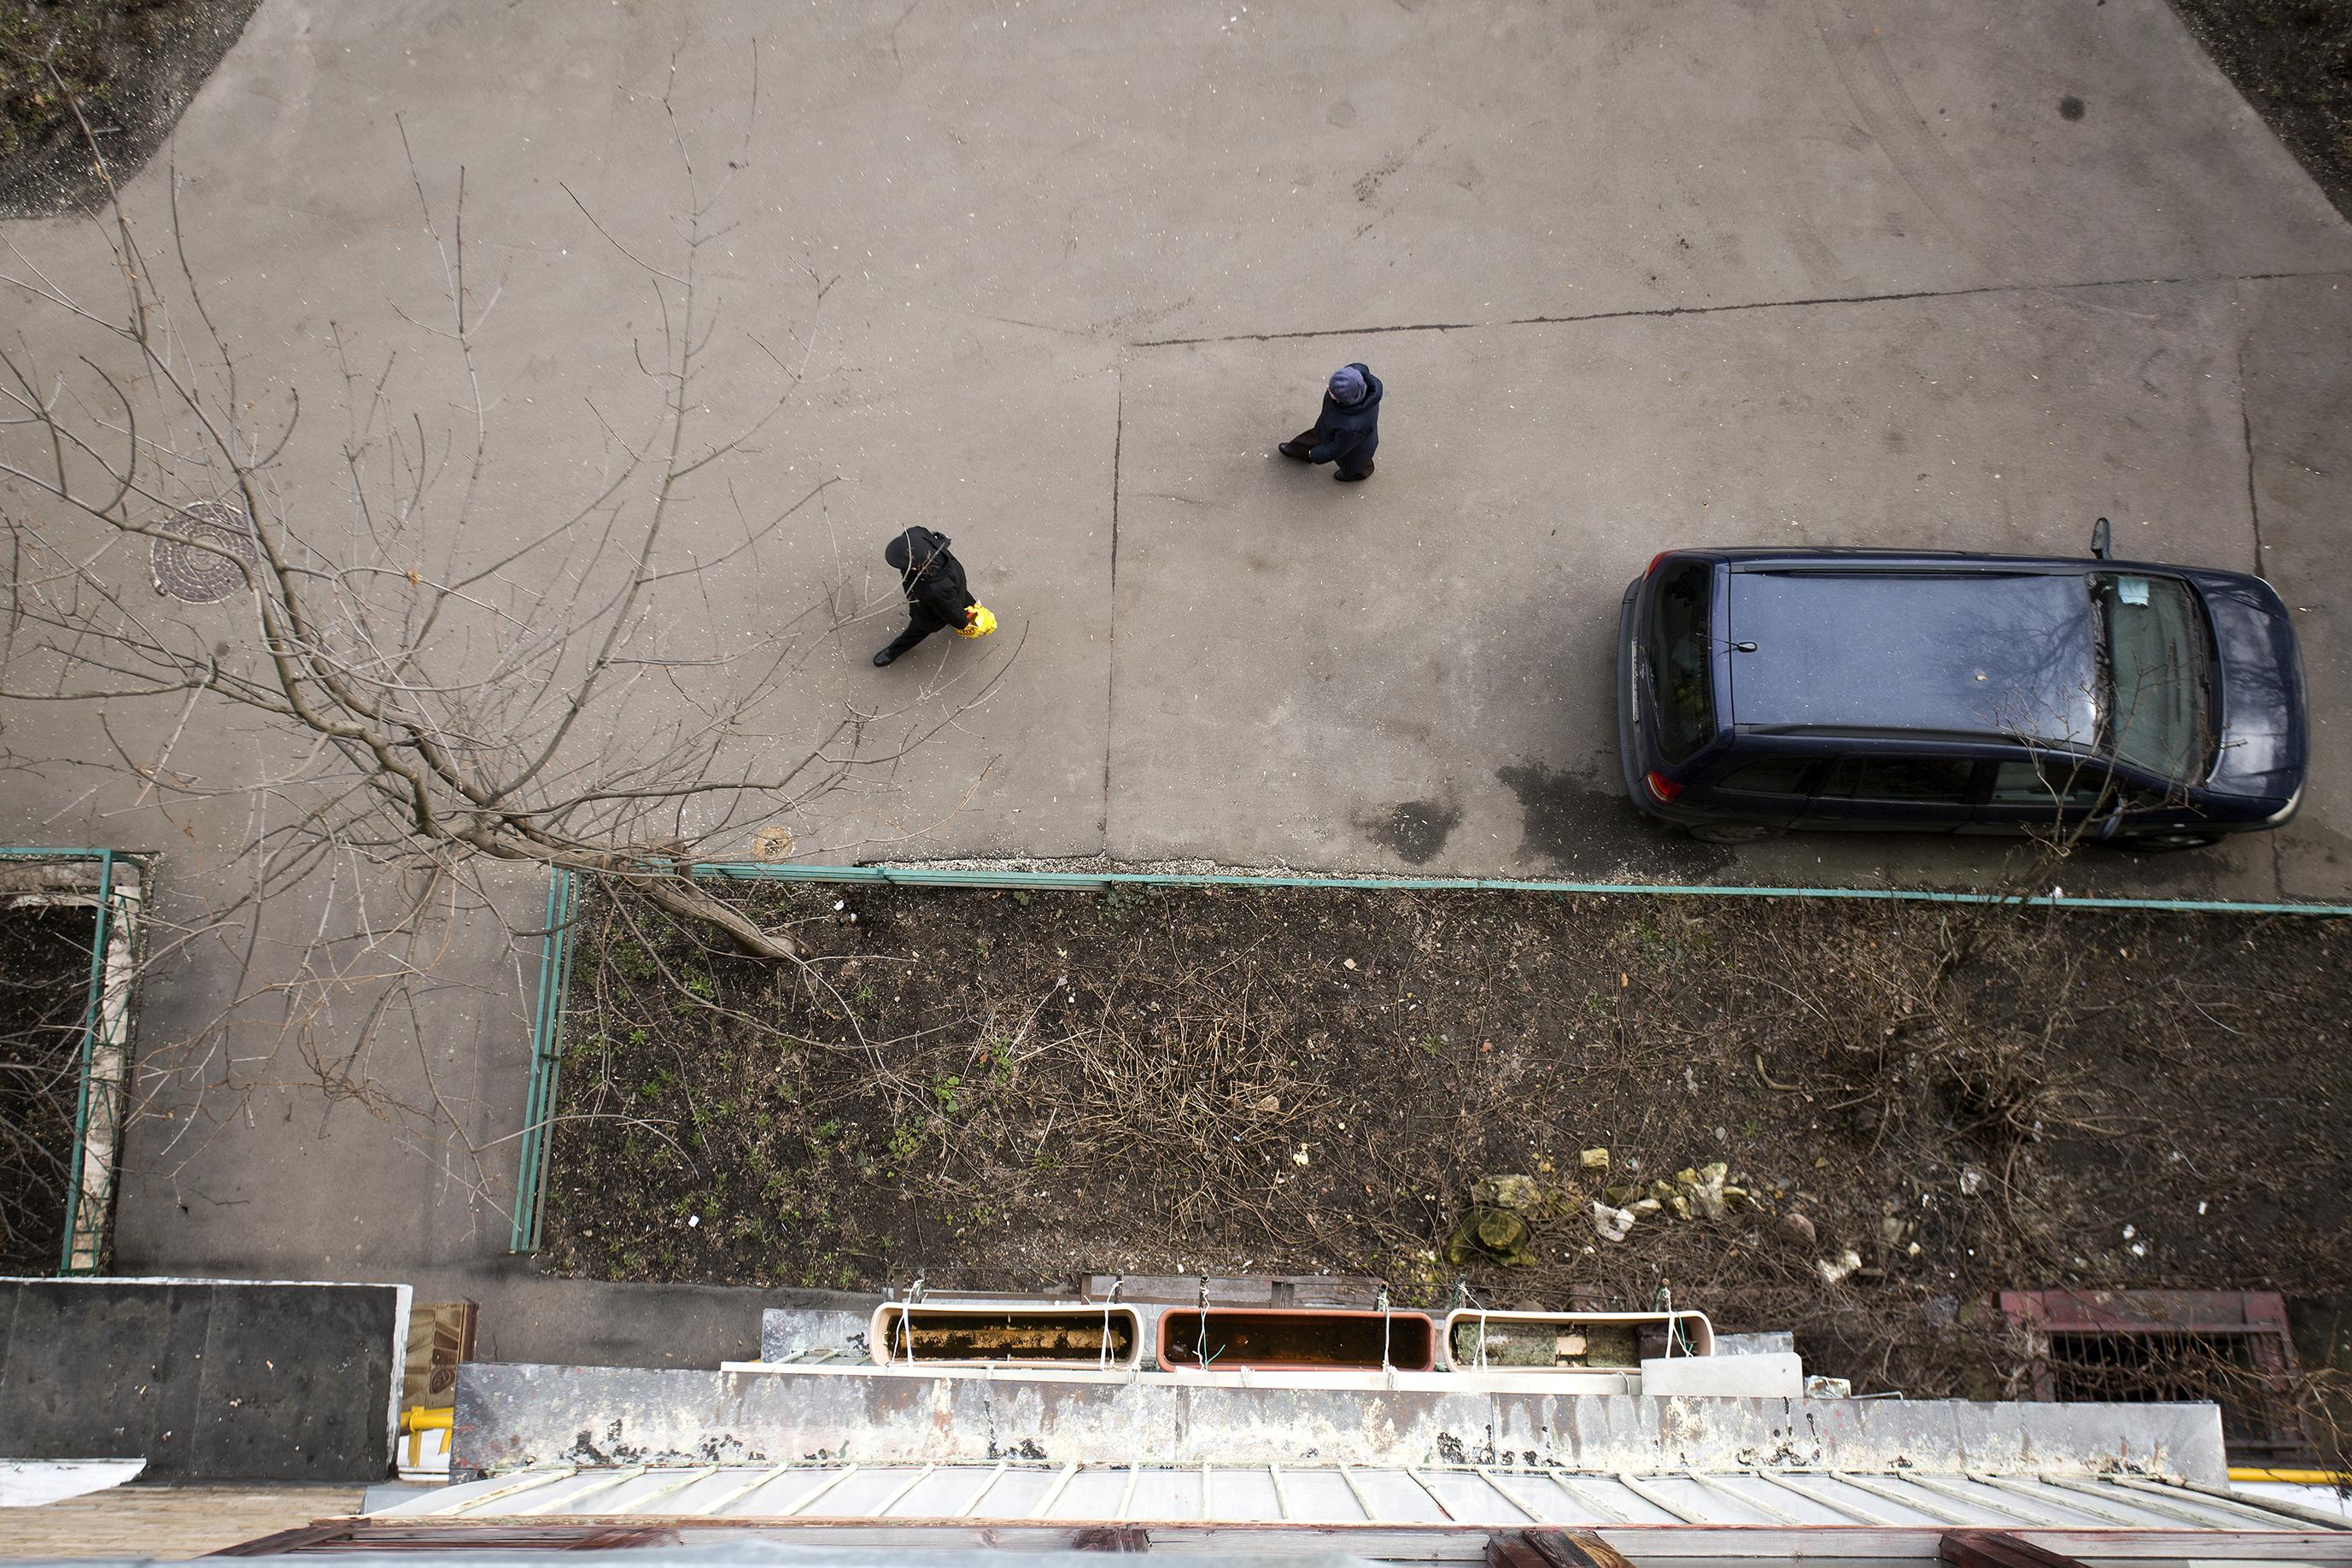 Journal de la quarantaine, 29 mars 2020, Jour 11 © Kseniya Yablonskaya